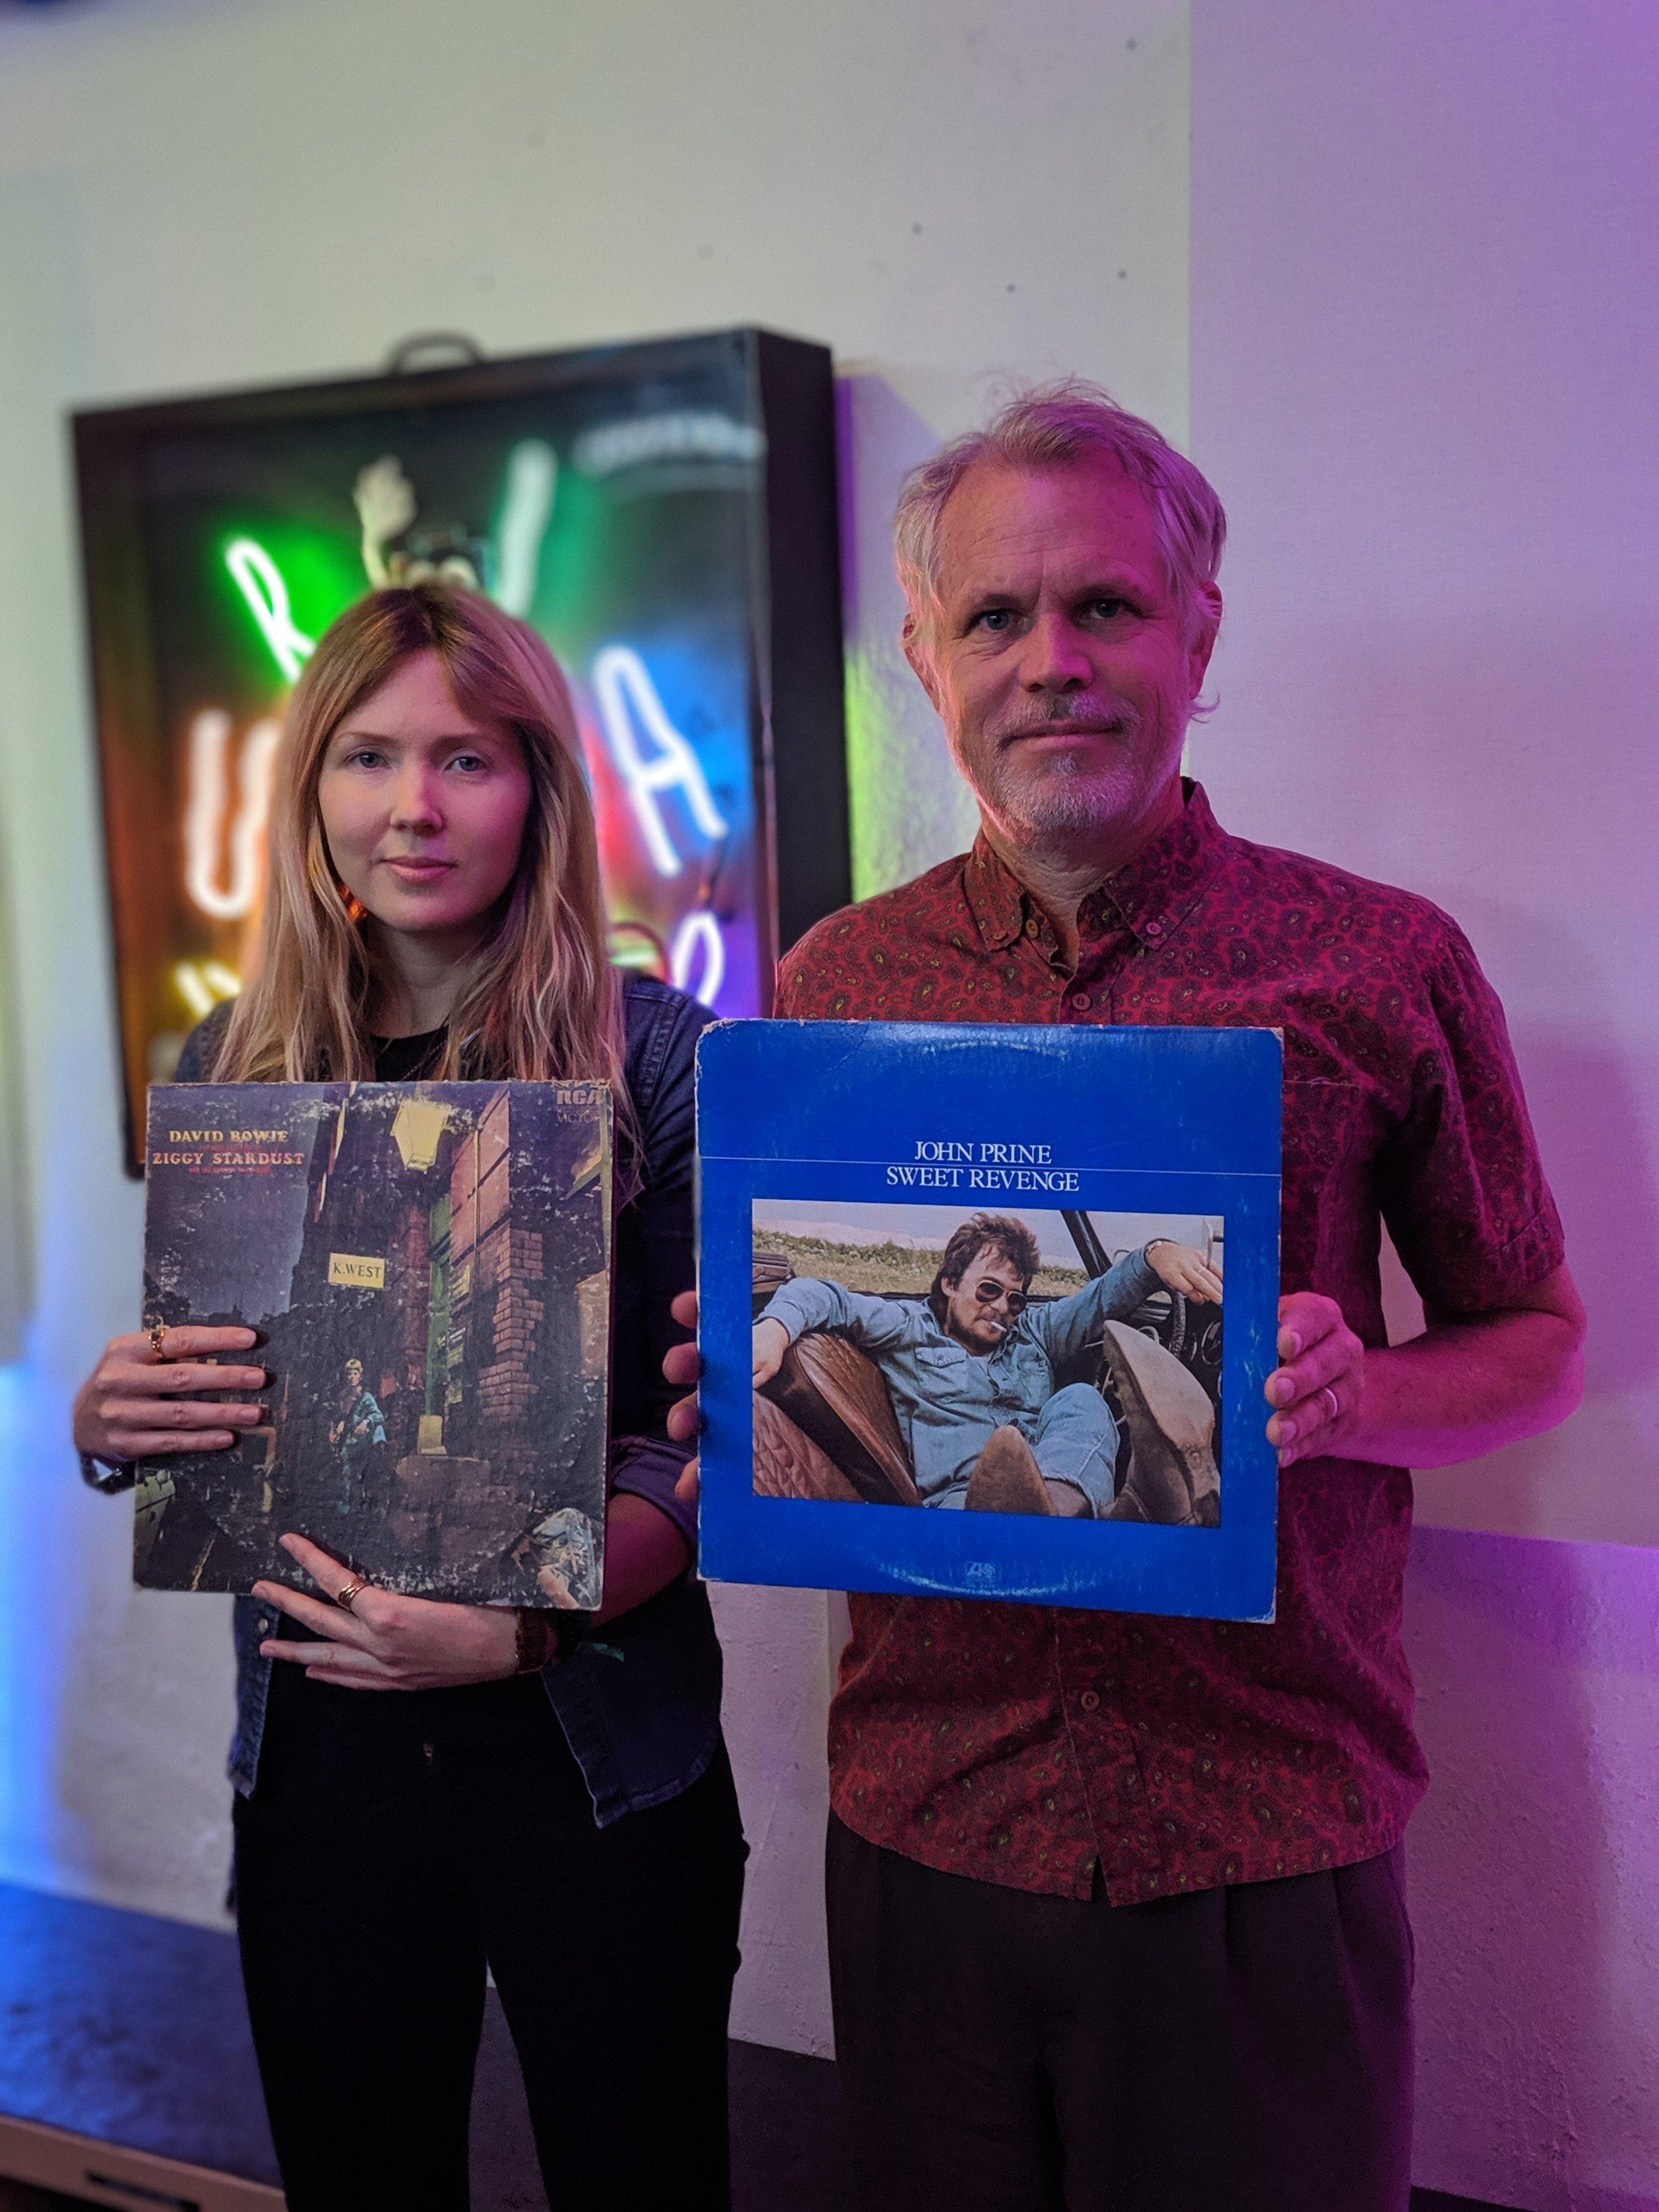 Ross Harris and Beatie Wolfe at LA's dublab radio